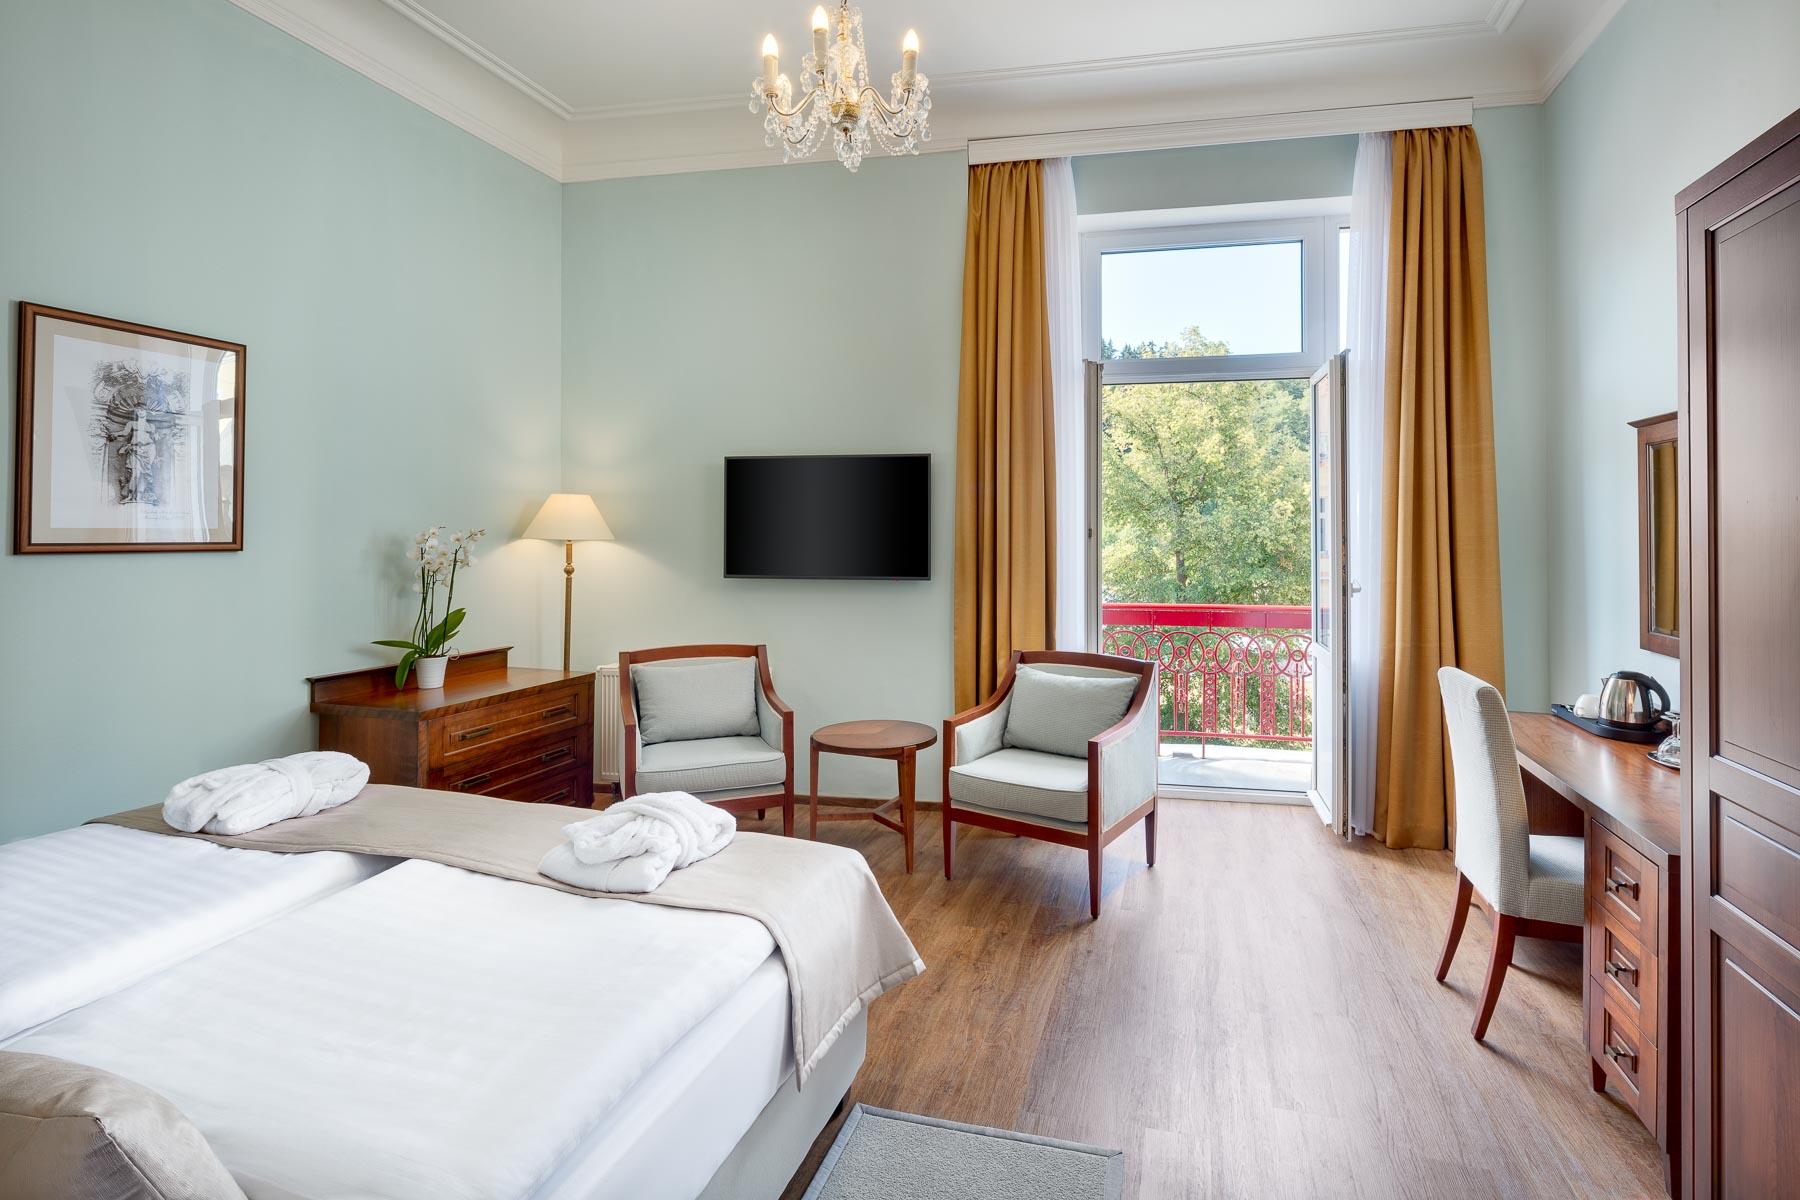 Hotel Maria Spa, Marienbad, Marianske lazne, spa